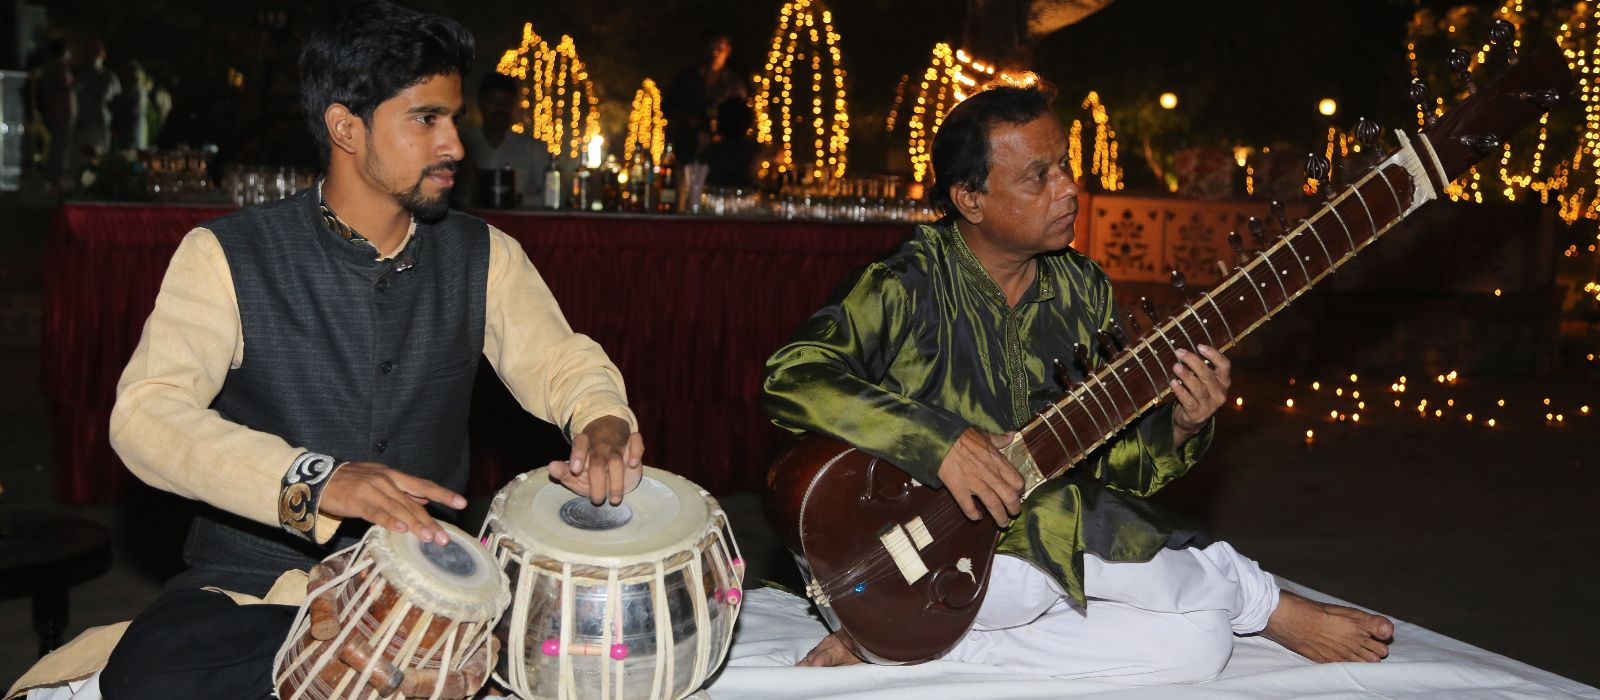 Festive Fever: Diwali in India Tour Trip 6